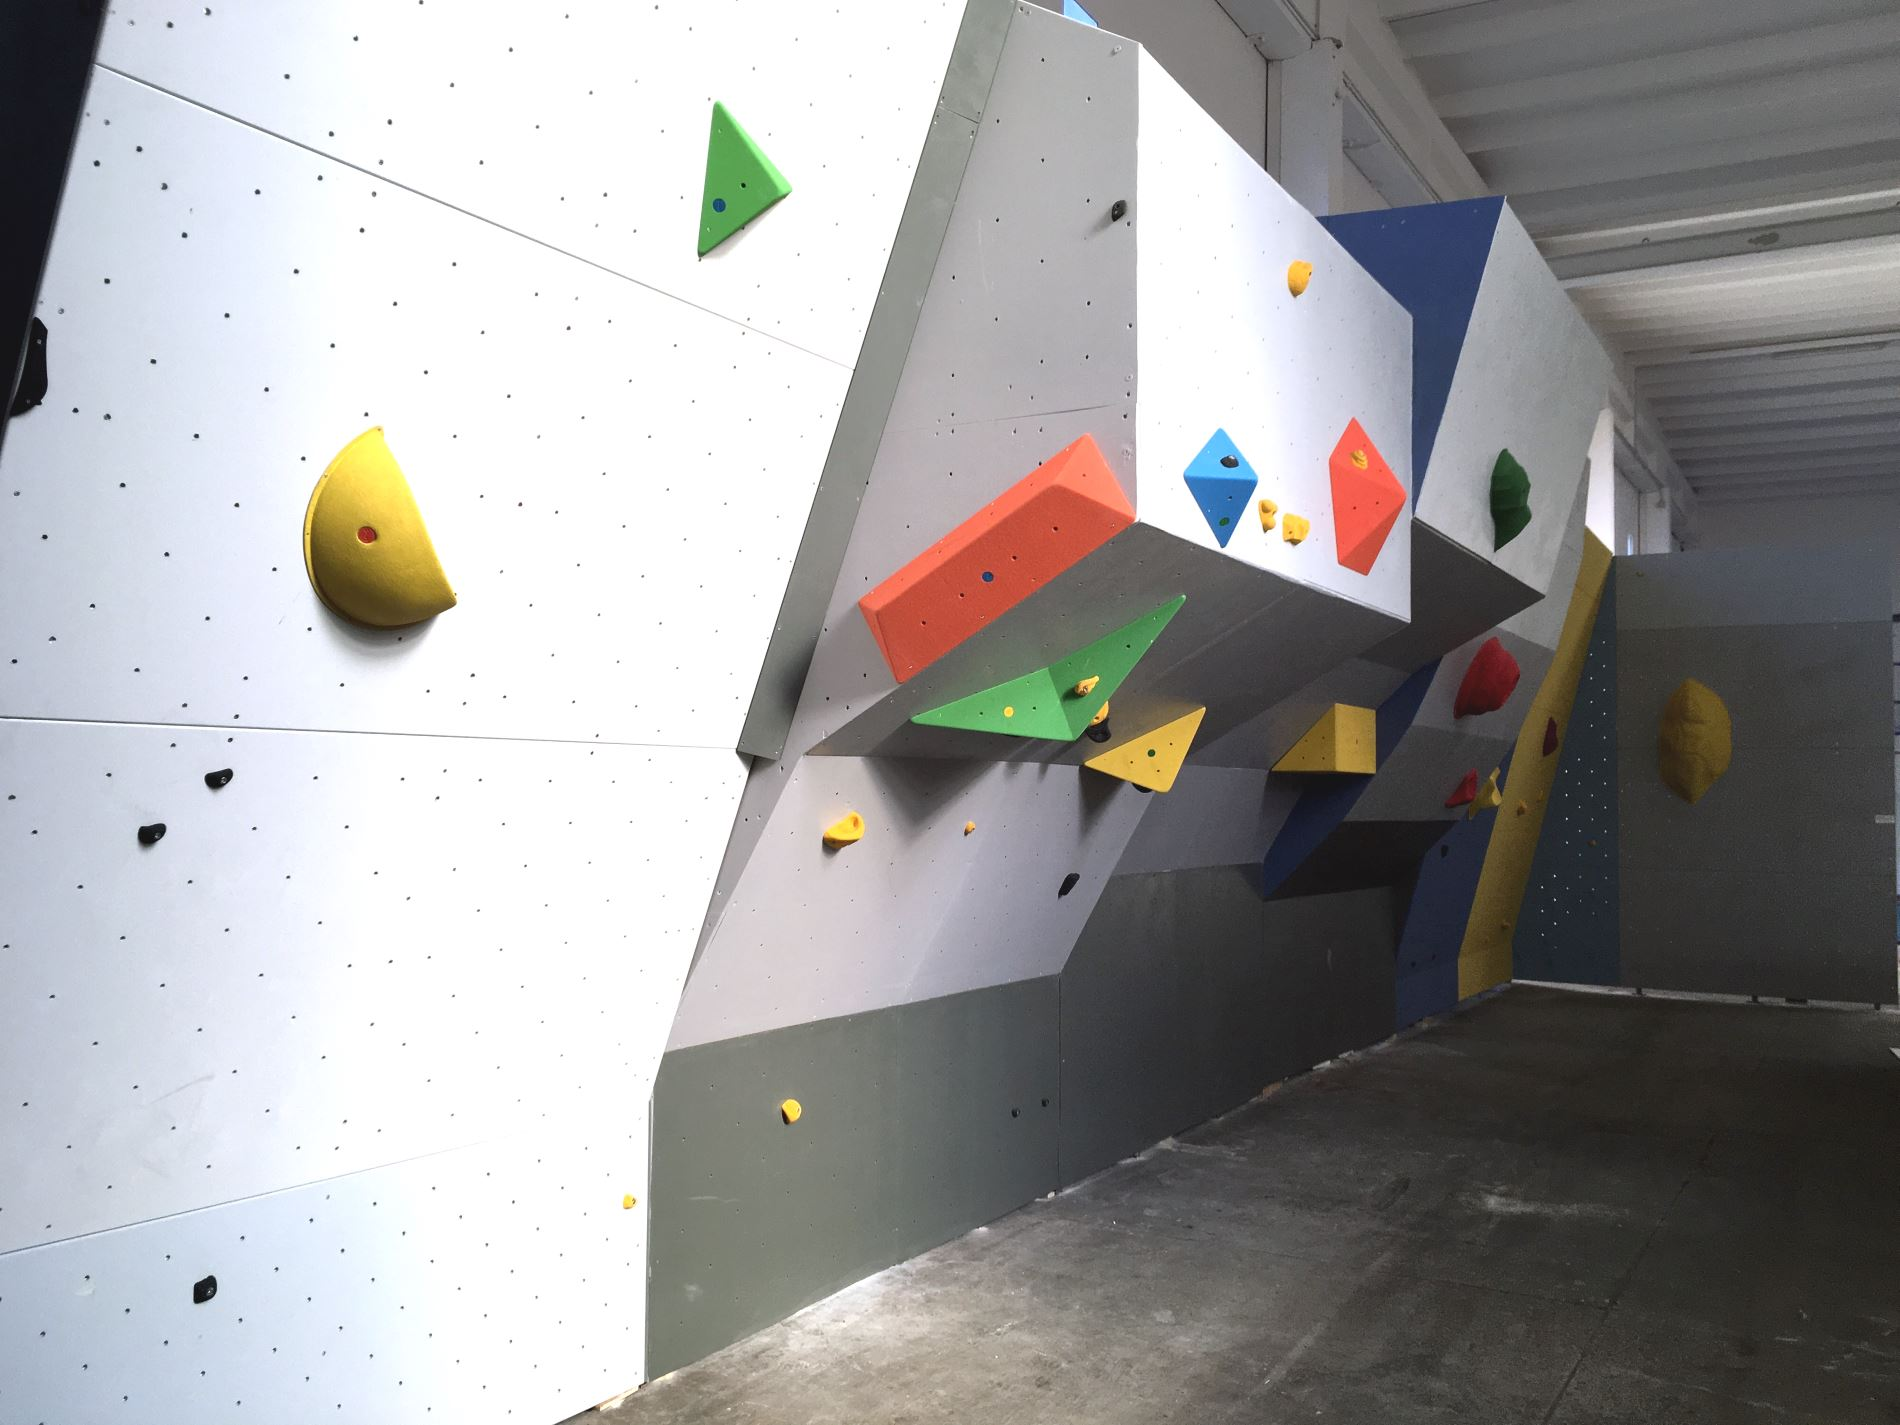 Volumi parete arrampicata resina a Pesaro